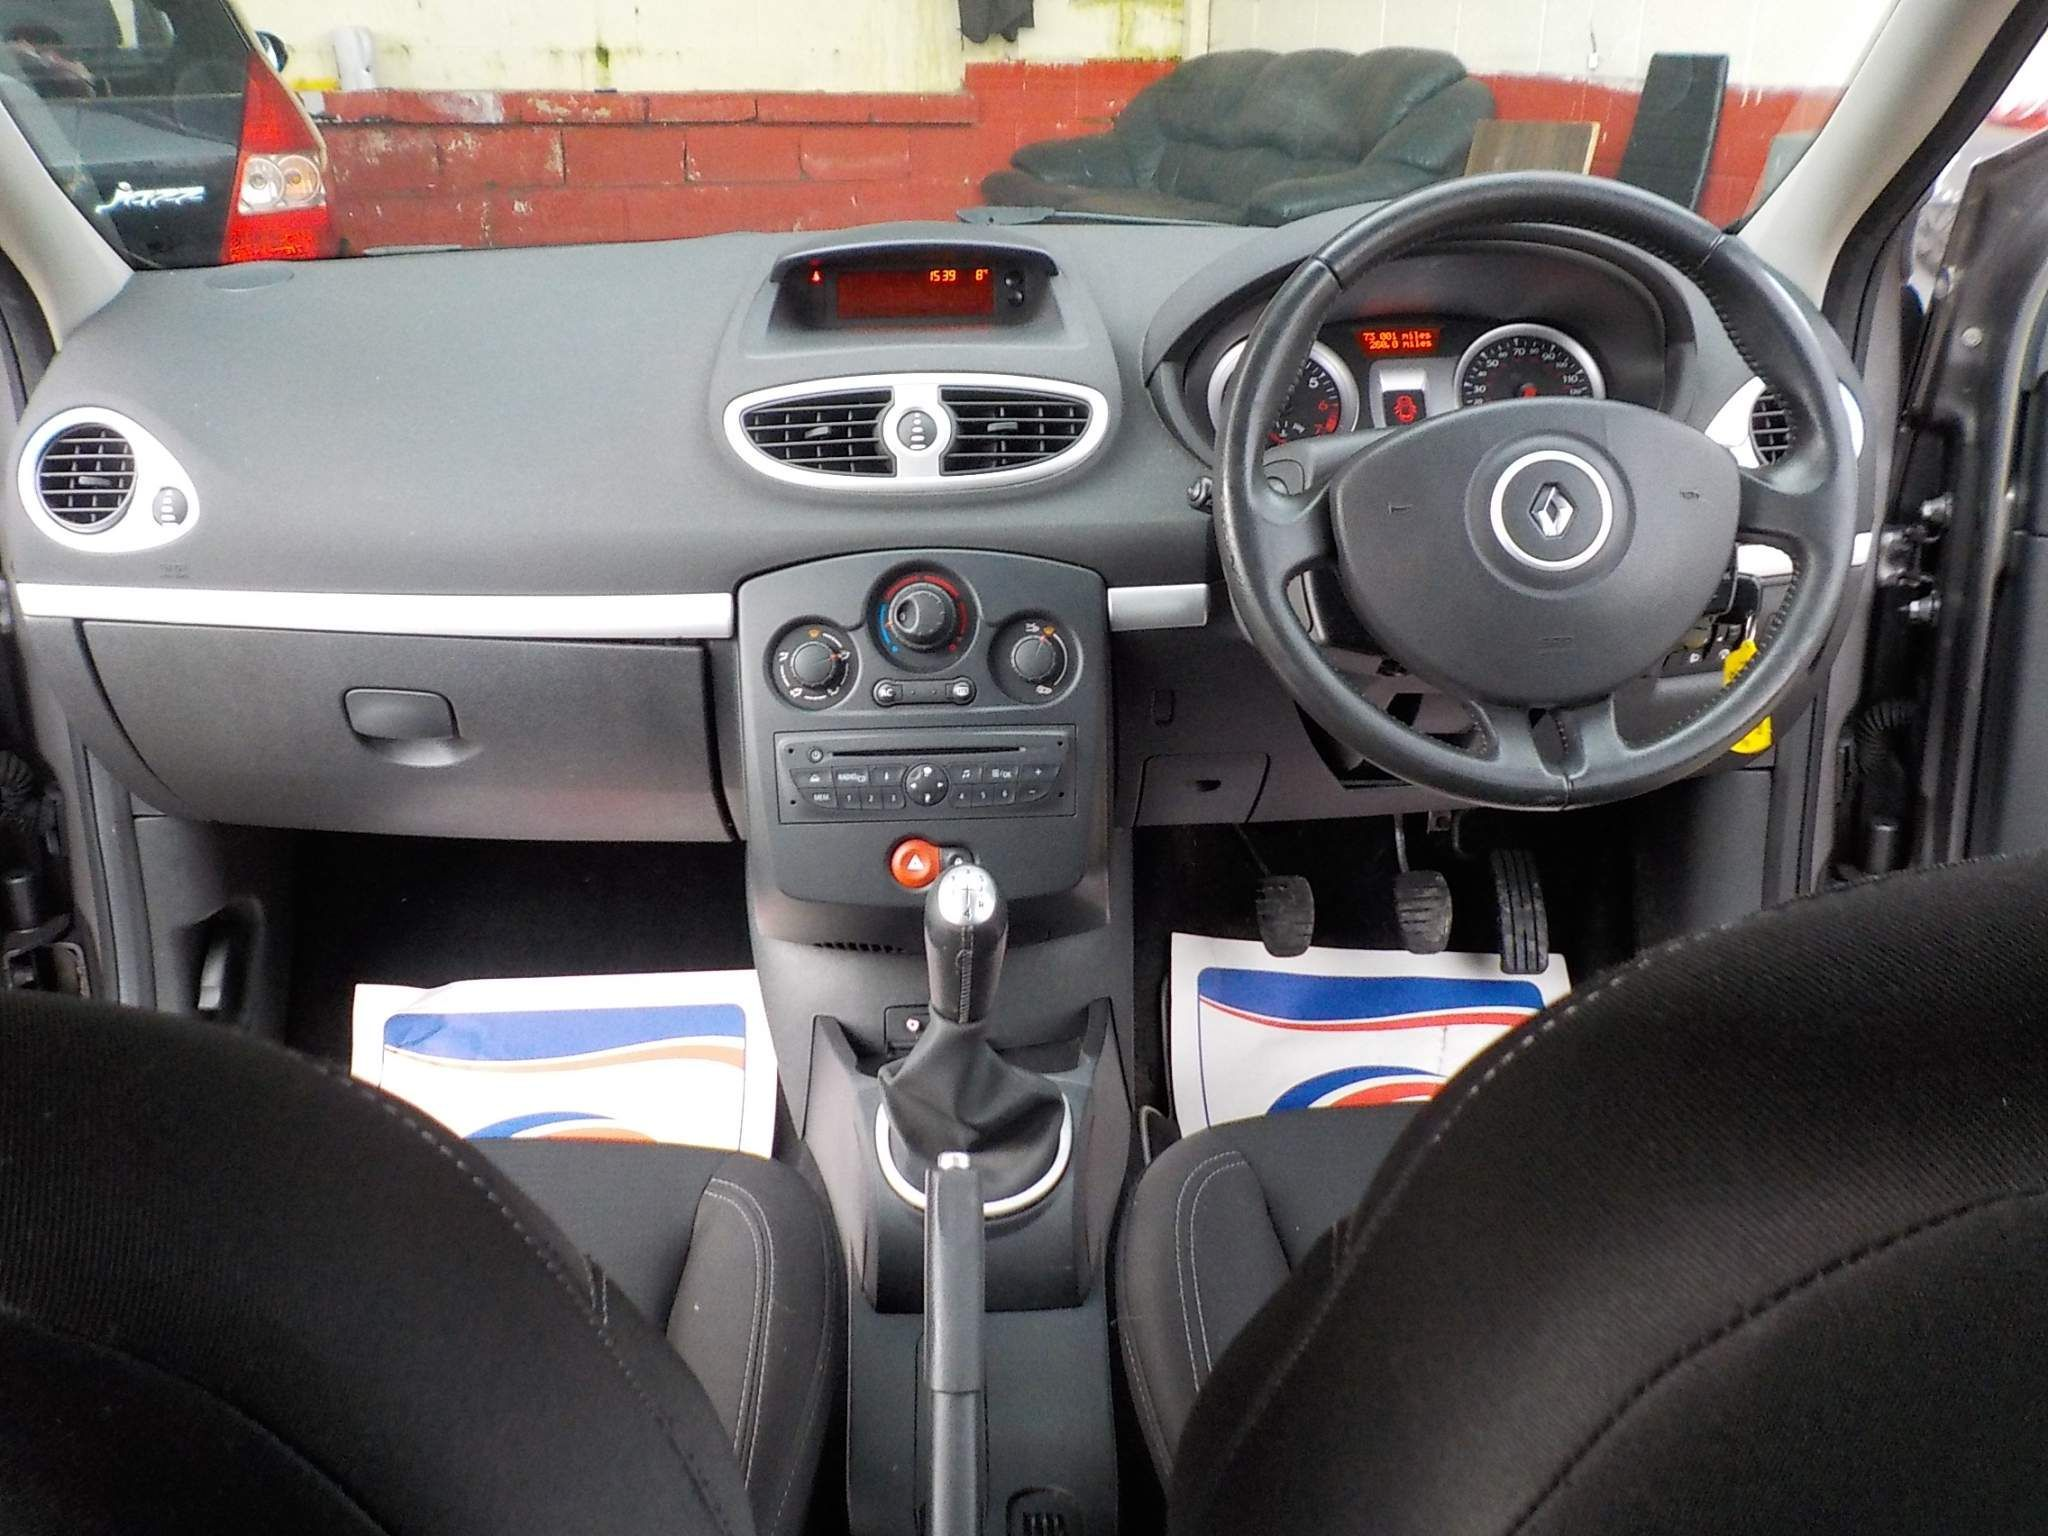 Renault Clio 1.2 16v Dynamique Sport Tourer 5dr